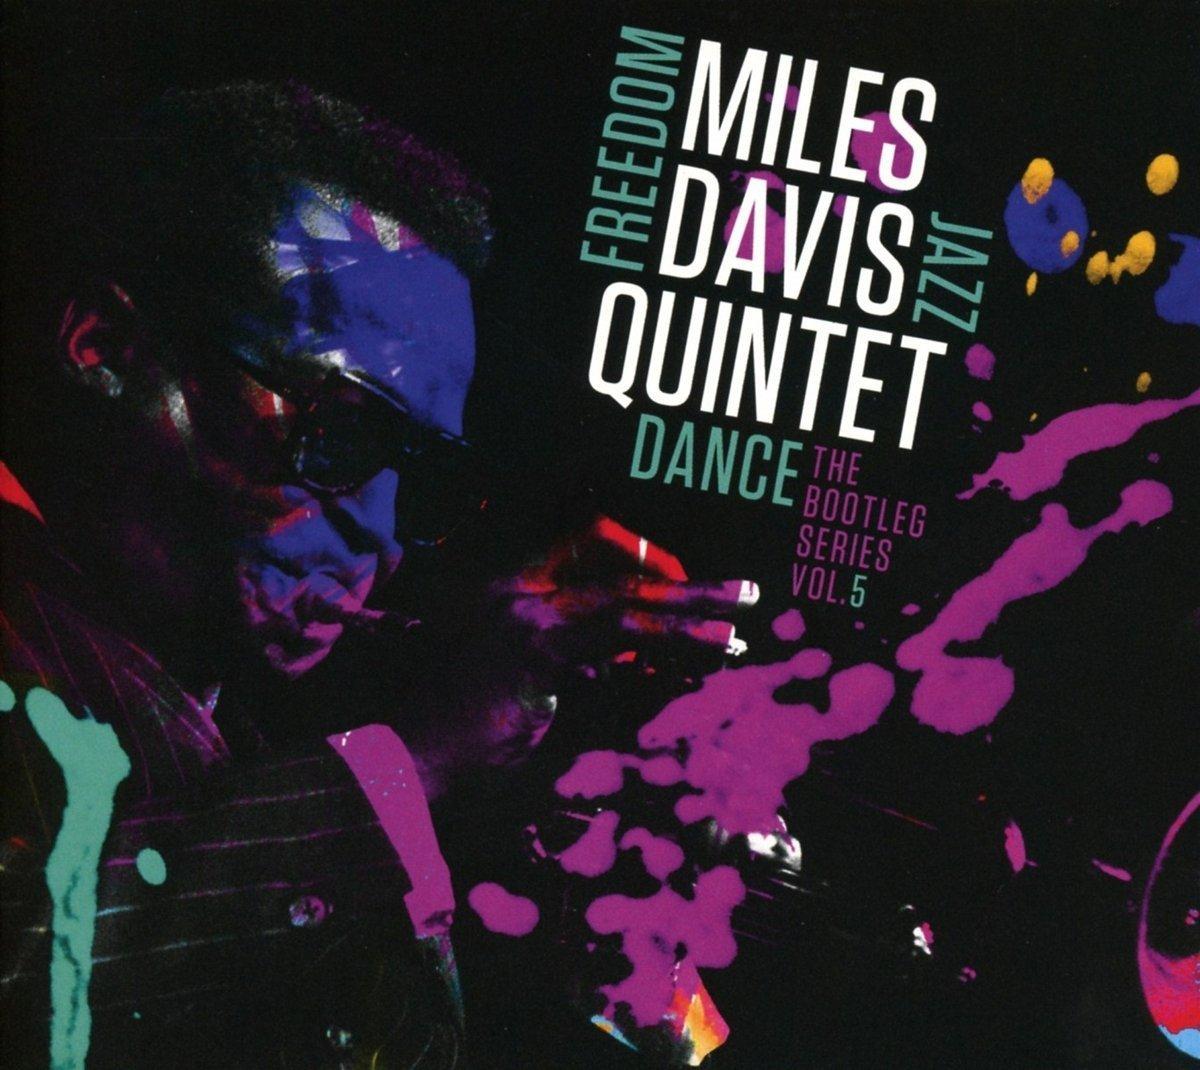 miles davis miles davis quintet freedom jazz da nce the bootleg series vol 5 amazoncom music - Davis Halloween Store